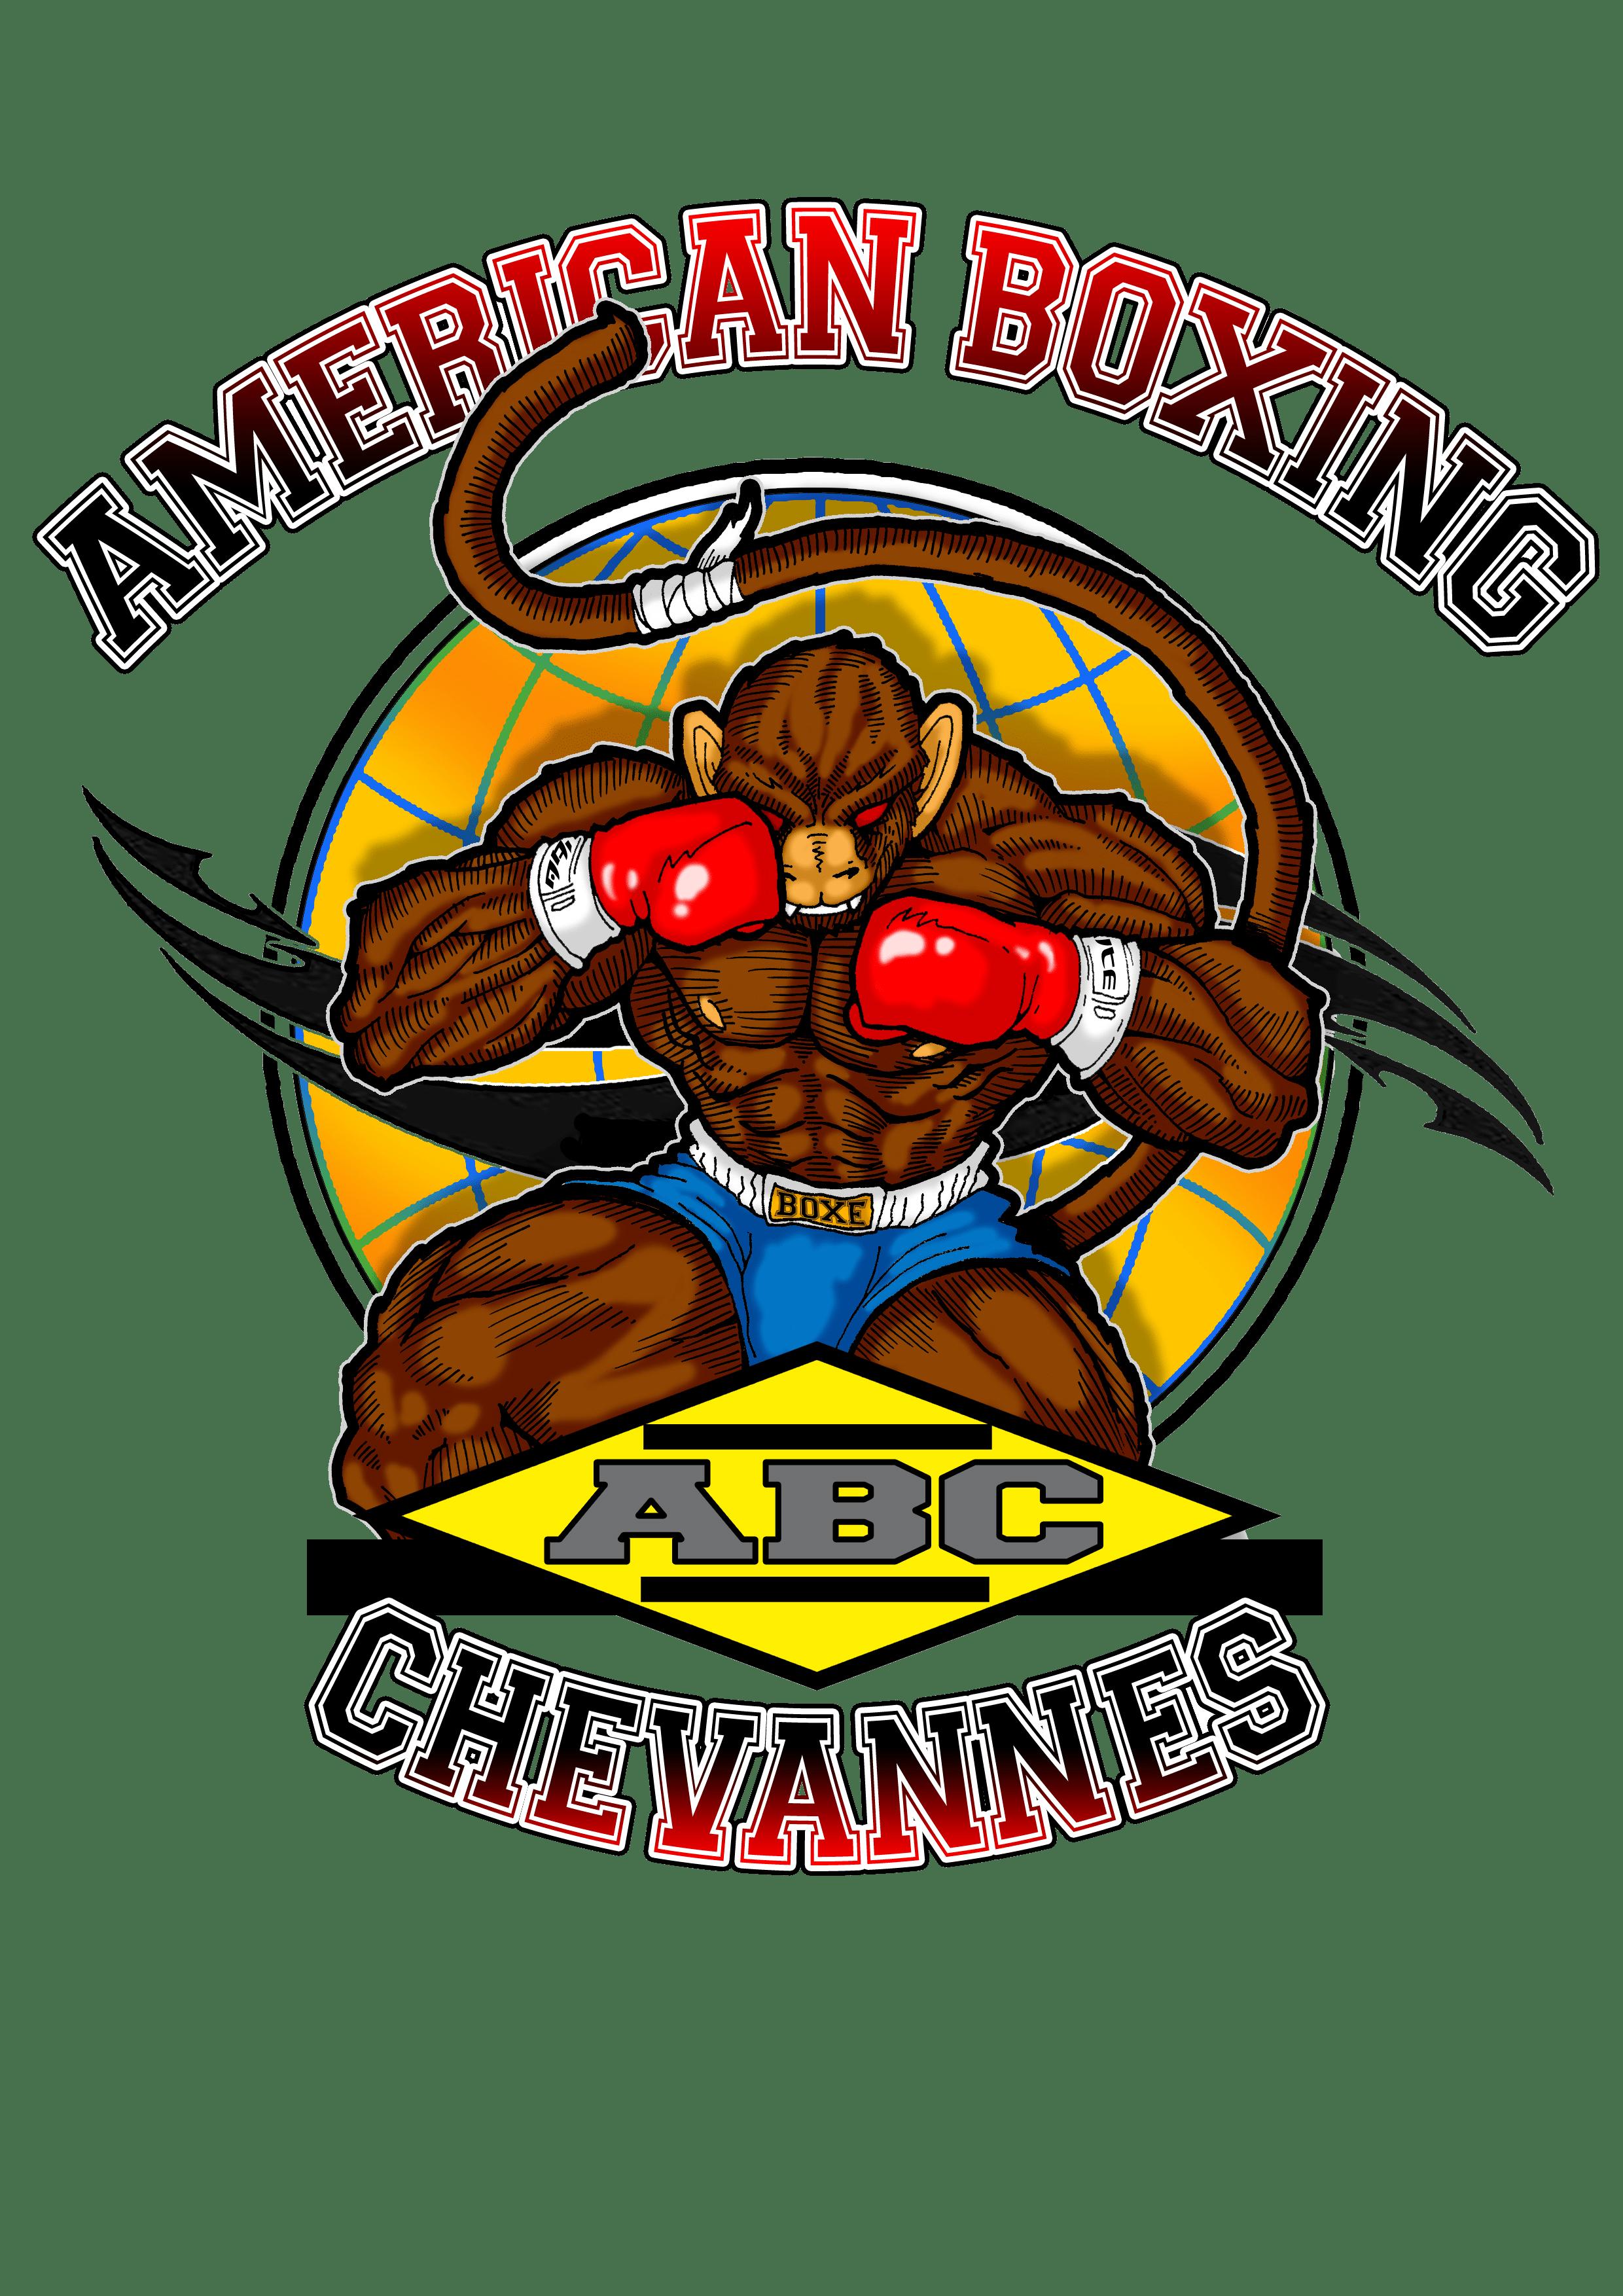 American Boxing logo